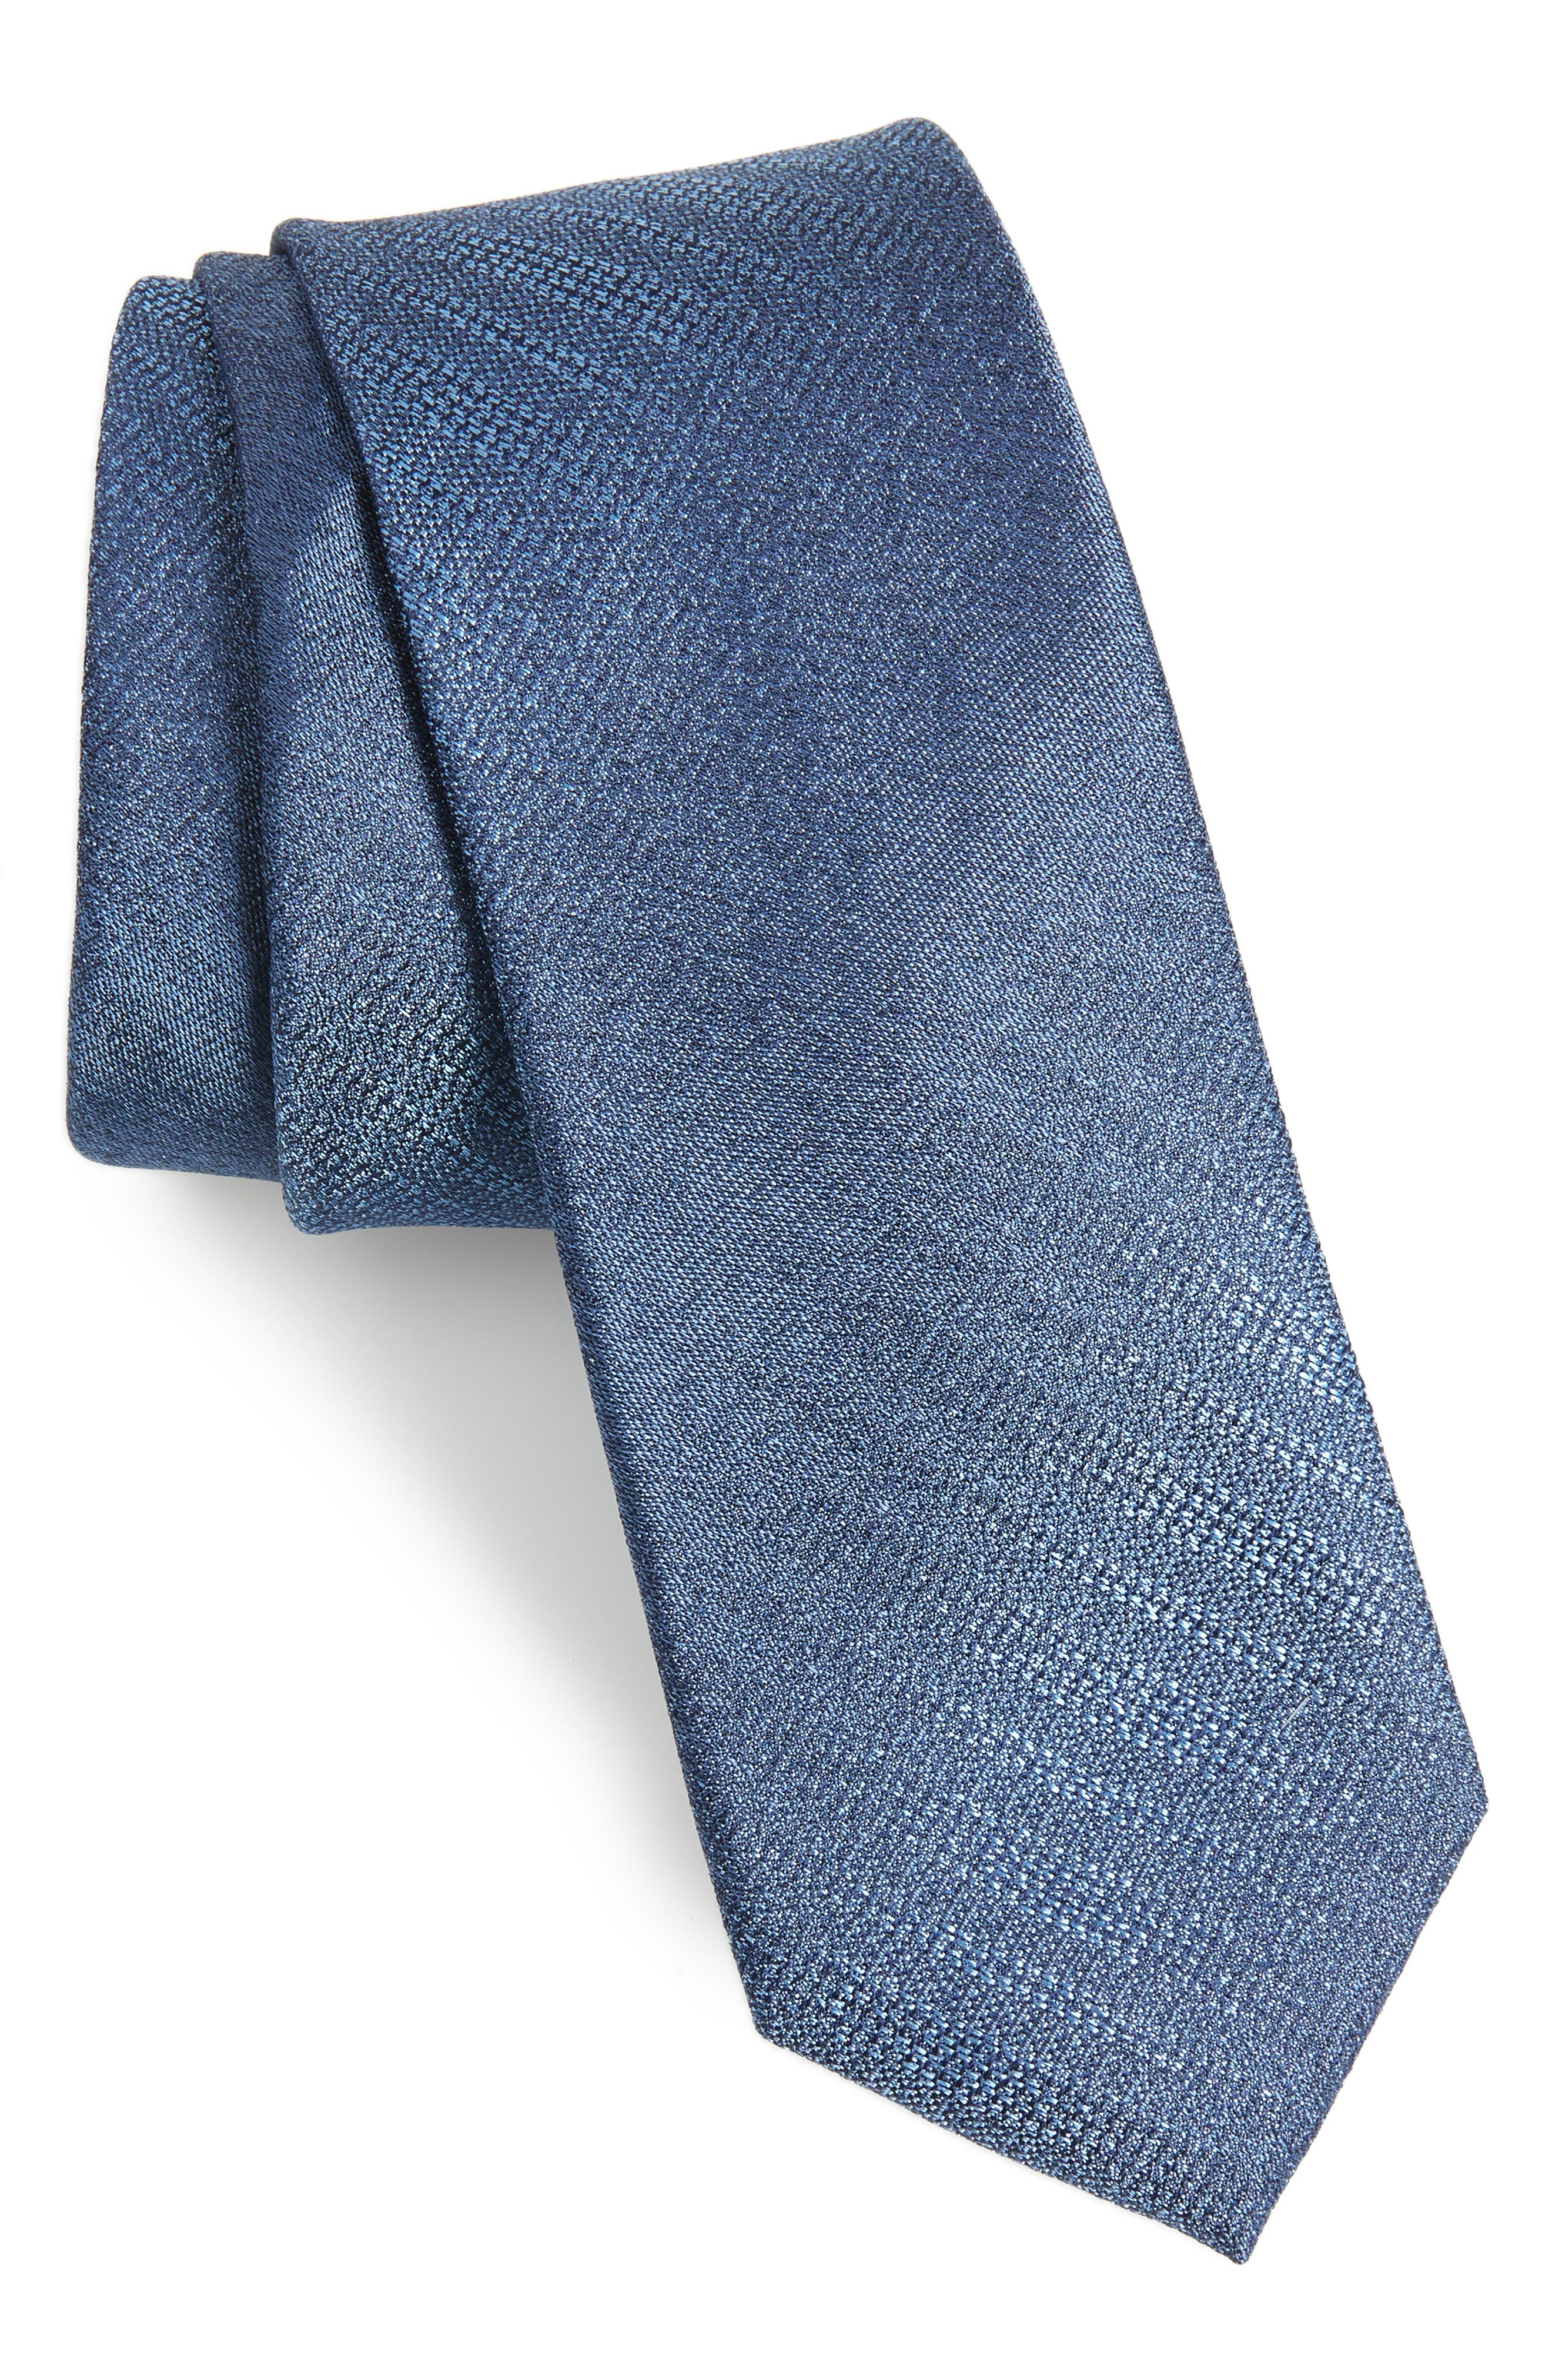 Gneiss Stripe Silk Skinny Tie,                             Main thumbnail 1, color,                             410